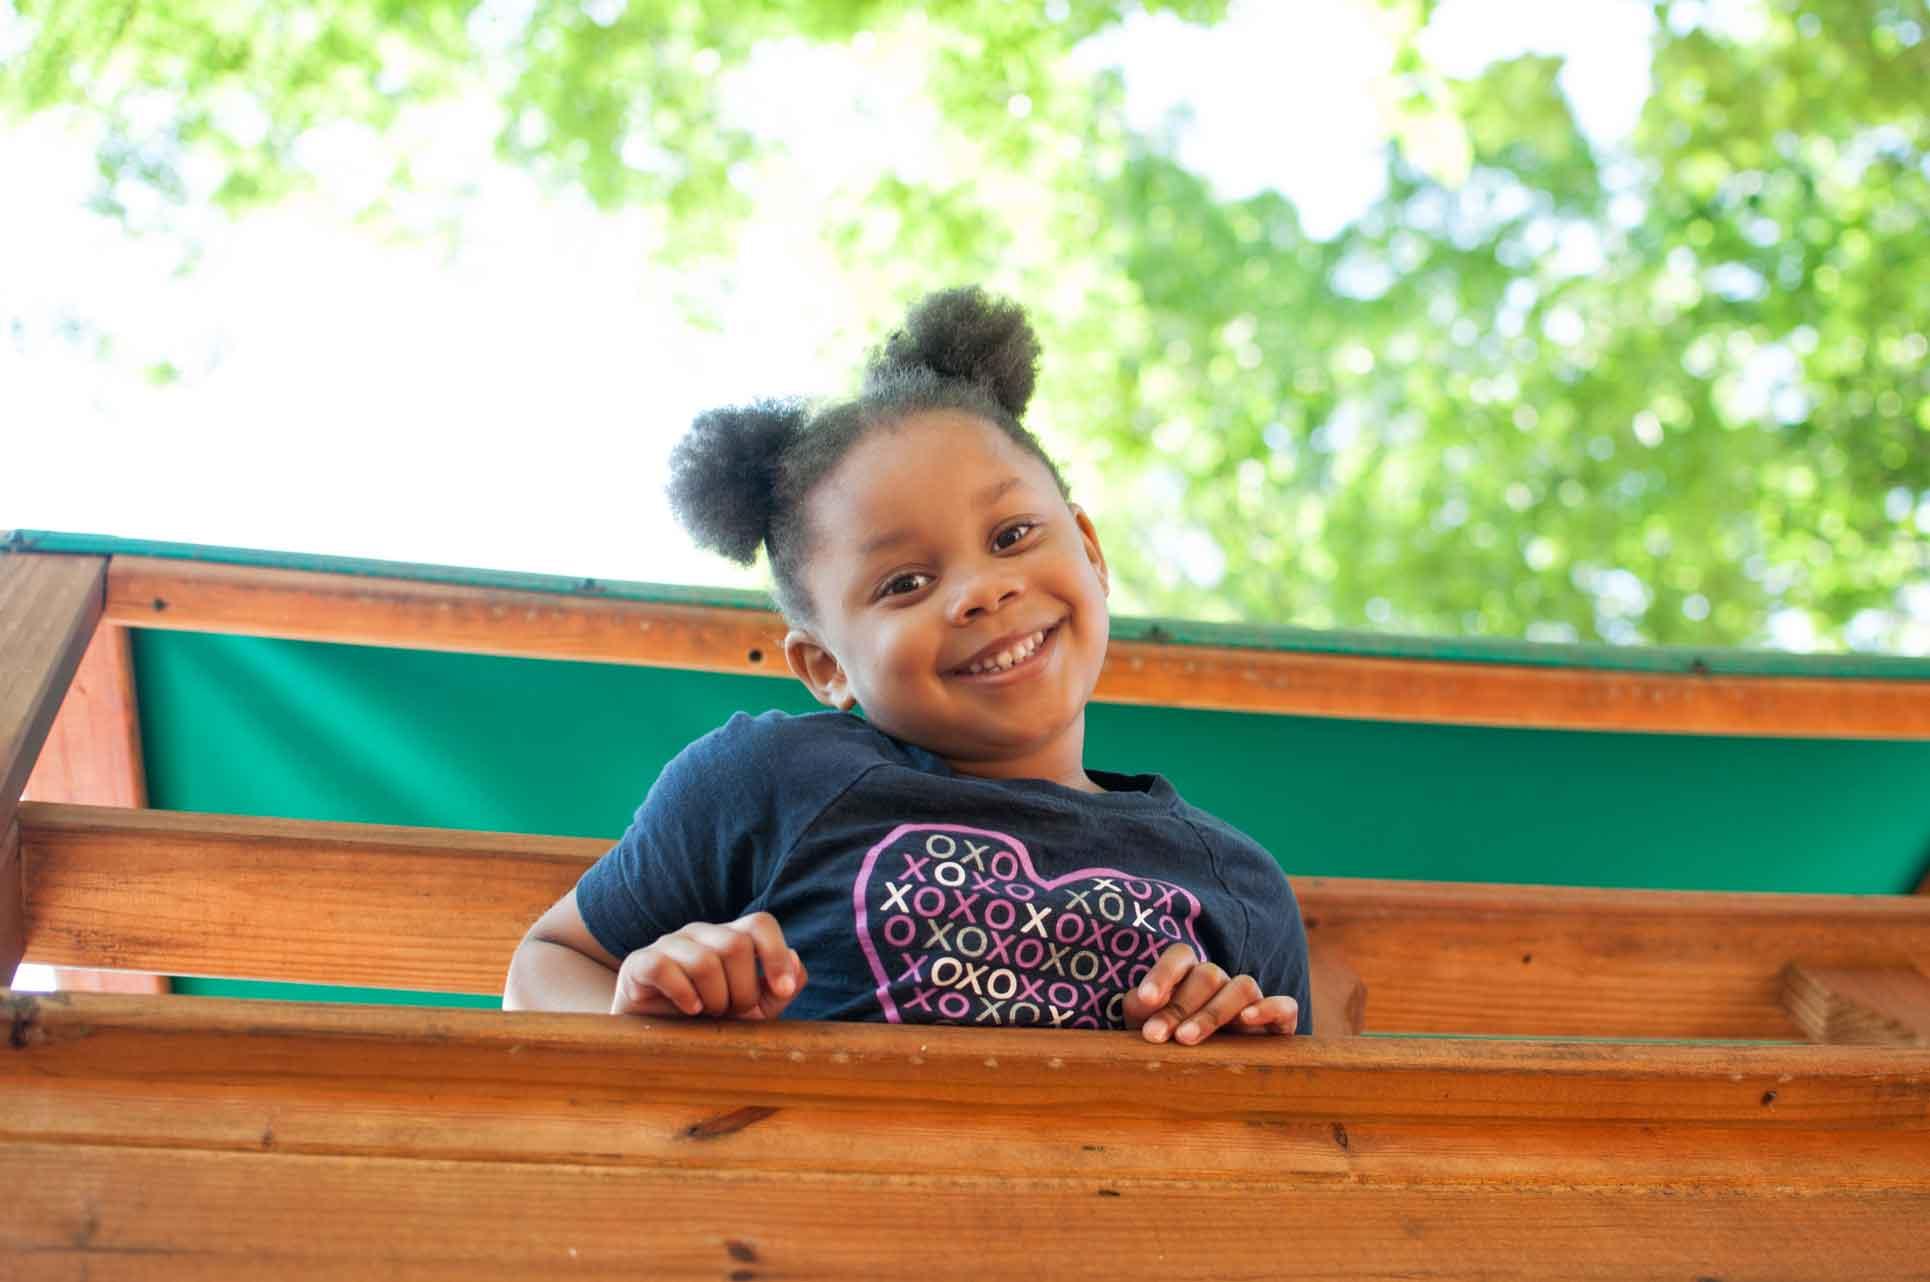 Private-Christian-School-Kindergarten-Student-Smiling-on-Playground-Faith-Christian-Academy-Located-Between-Burlington-and-Greensboro-NC